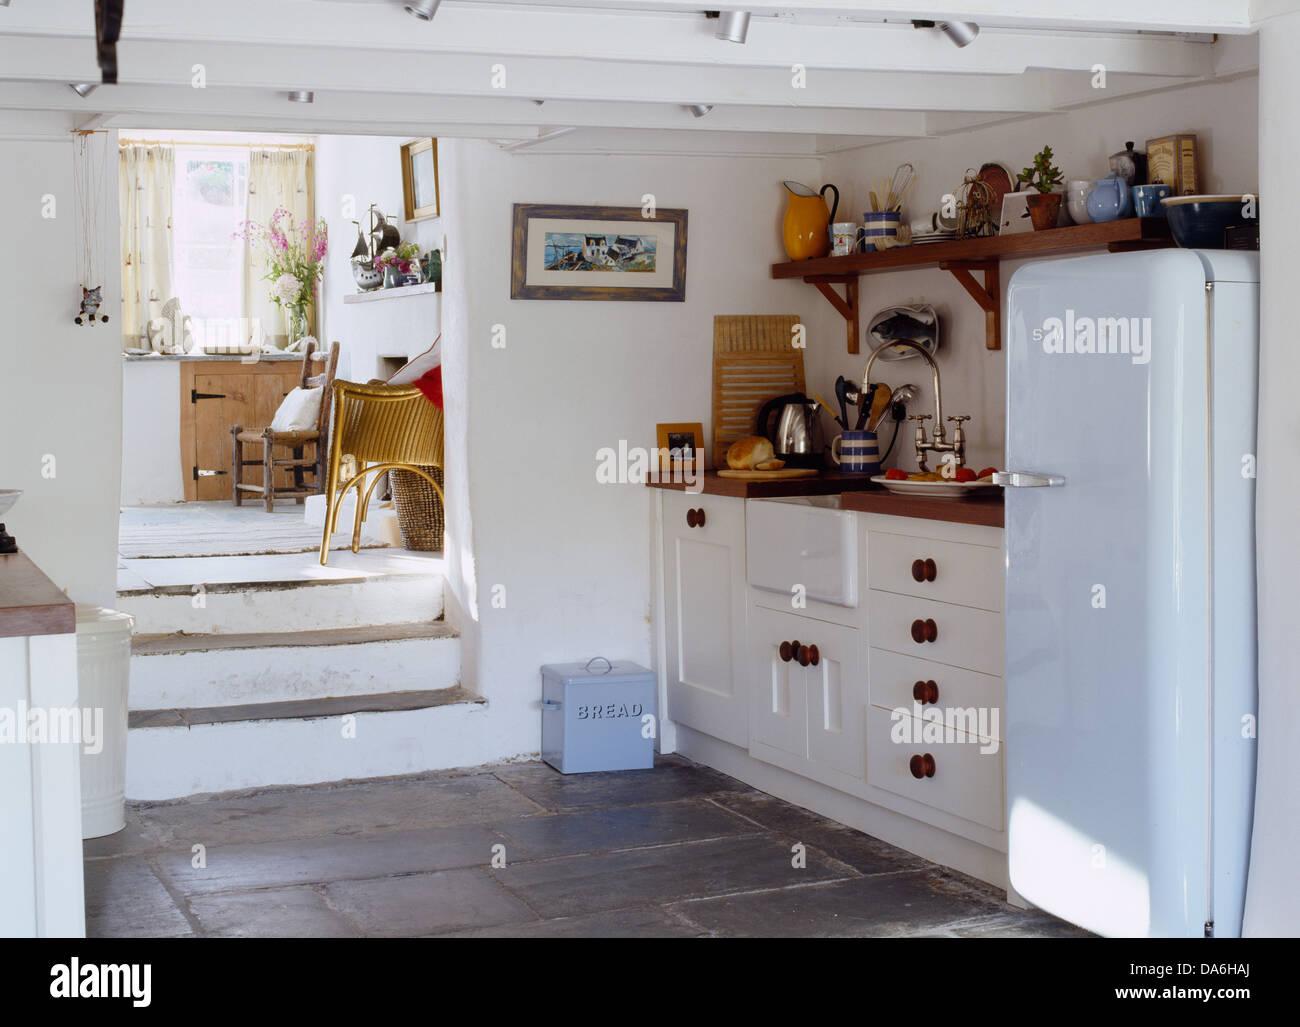 Smeg Kühlschrank Grau : Smeg fridge stockfotos smeg fridge bilder alamy